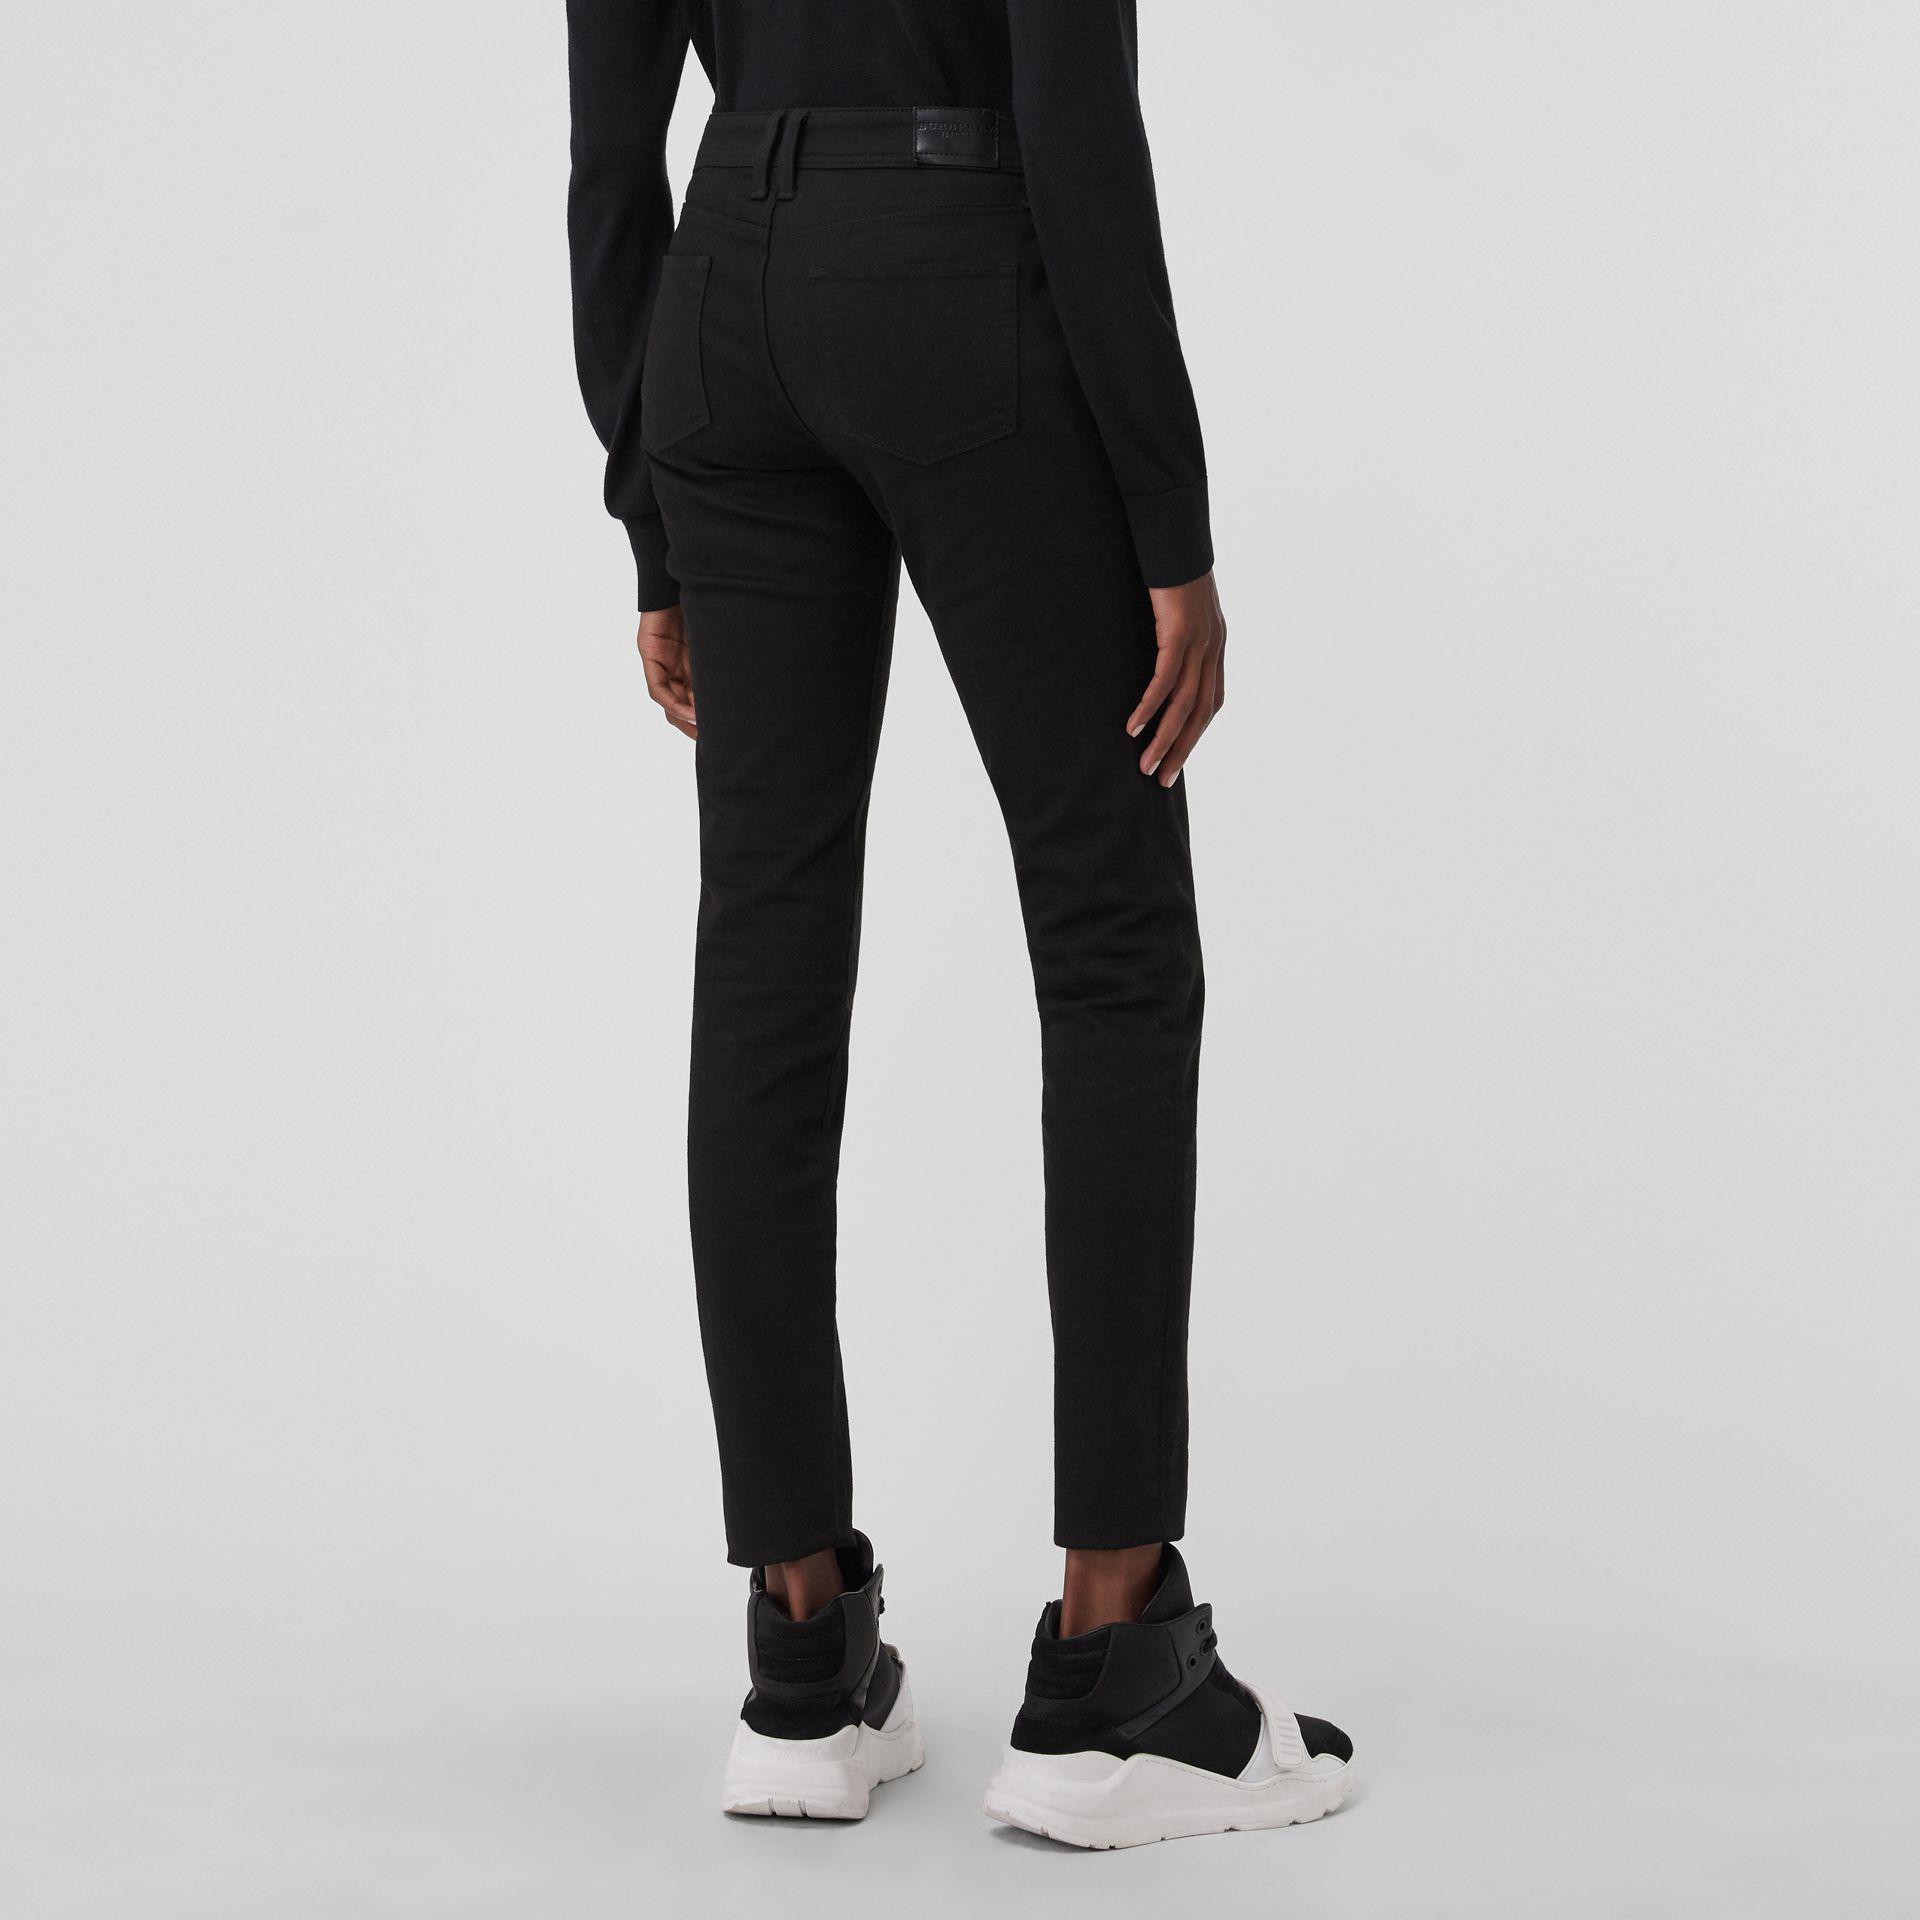 e3c0cb371f618 Burberry - Skinny Fit Low-rise Deep Black Jeans - Lyst. View fullscreen